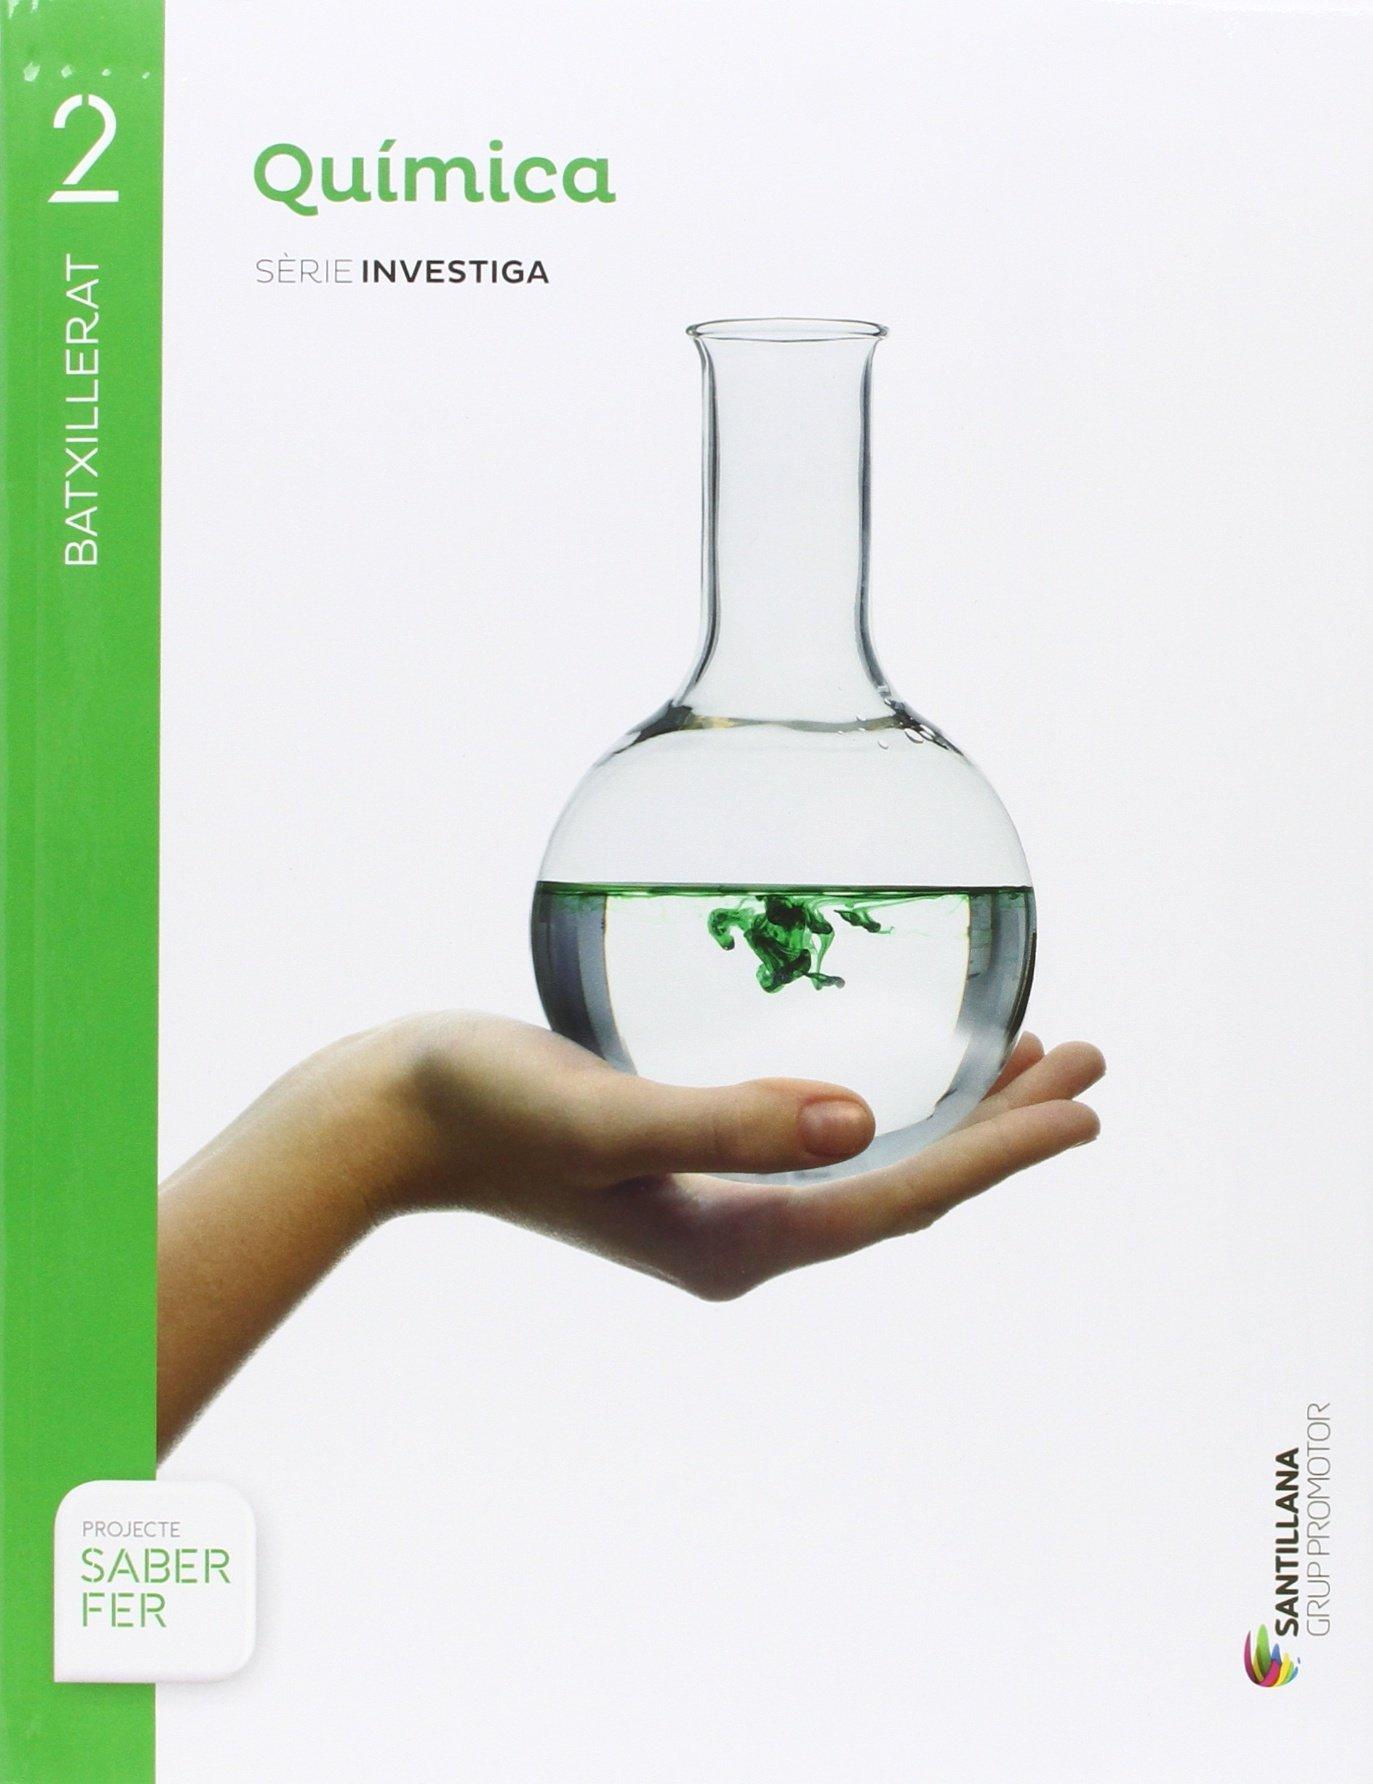 QUÍMICA SERIE INVESTIGA 2 BTX SABER FER - 9788491302810: Amazon.es: Aa.Vv.: Libros